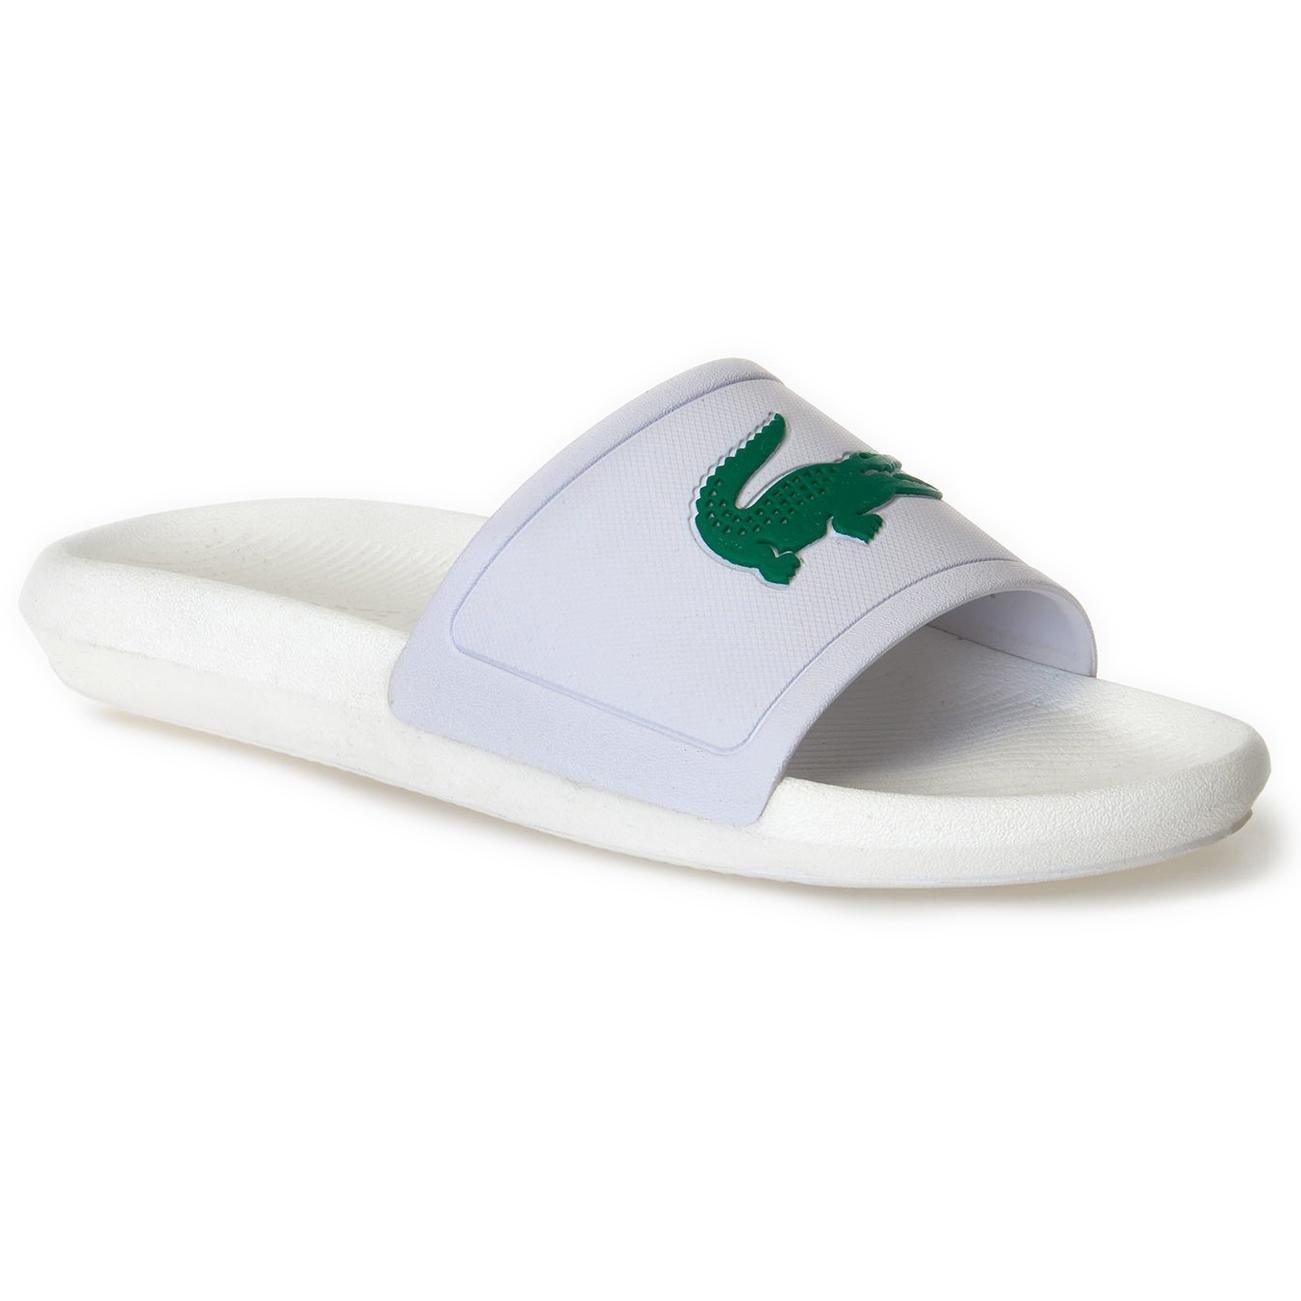 lacoste beach shoes